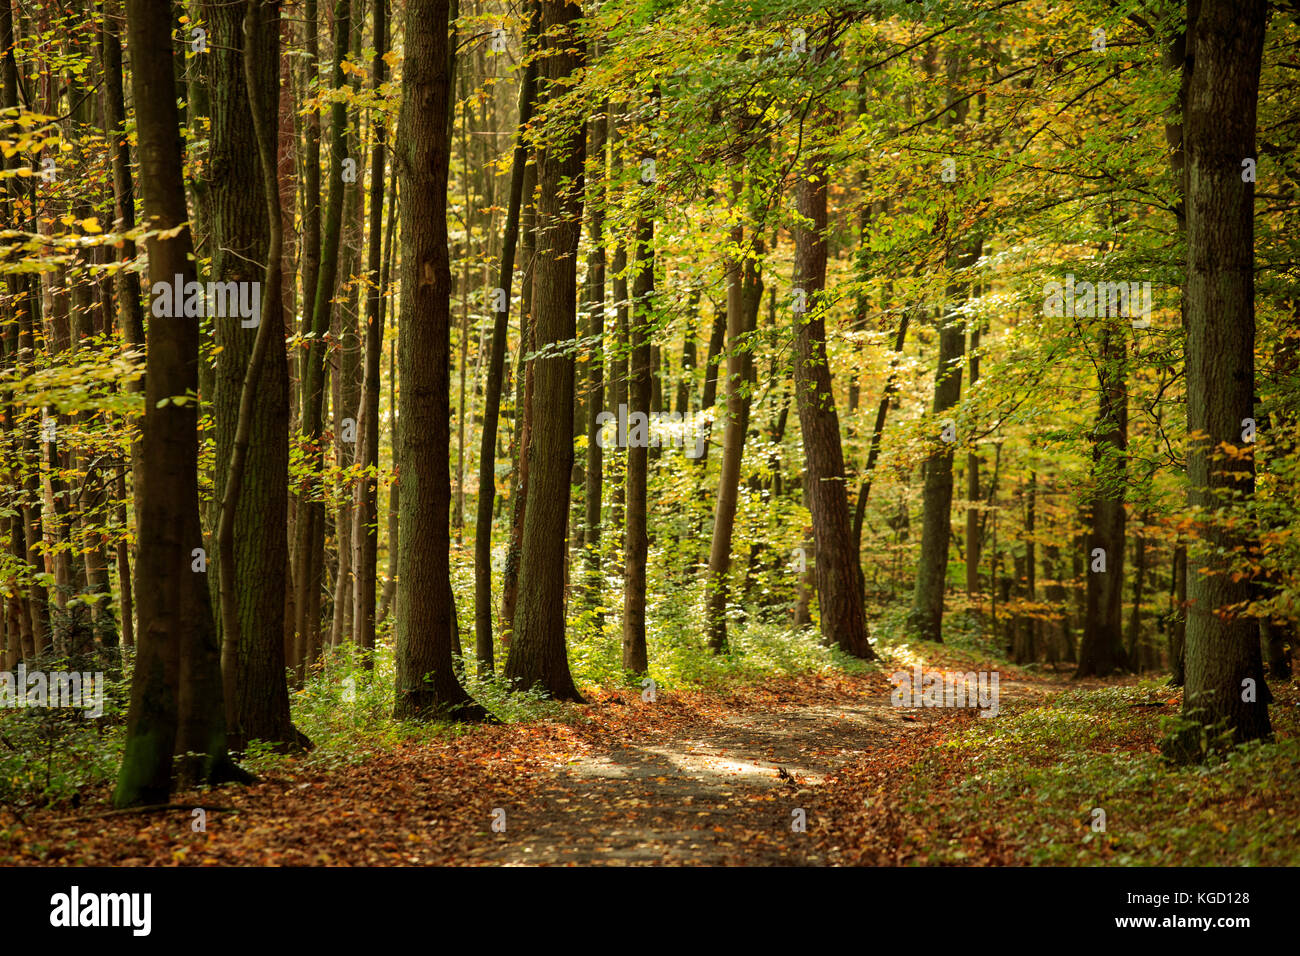 uhlenhorst-forest-aka-broich-speldorfer-